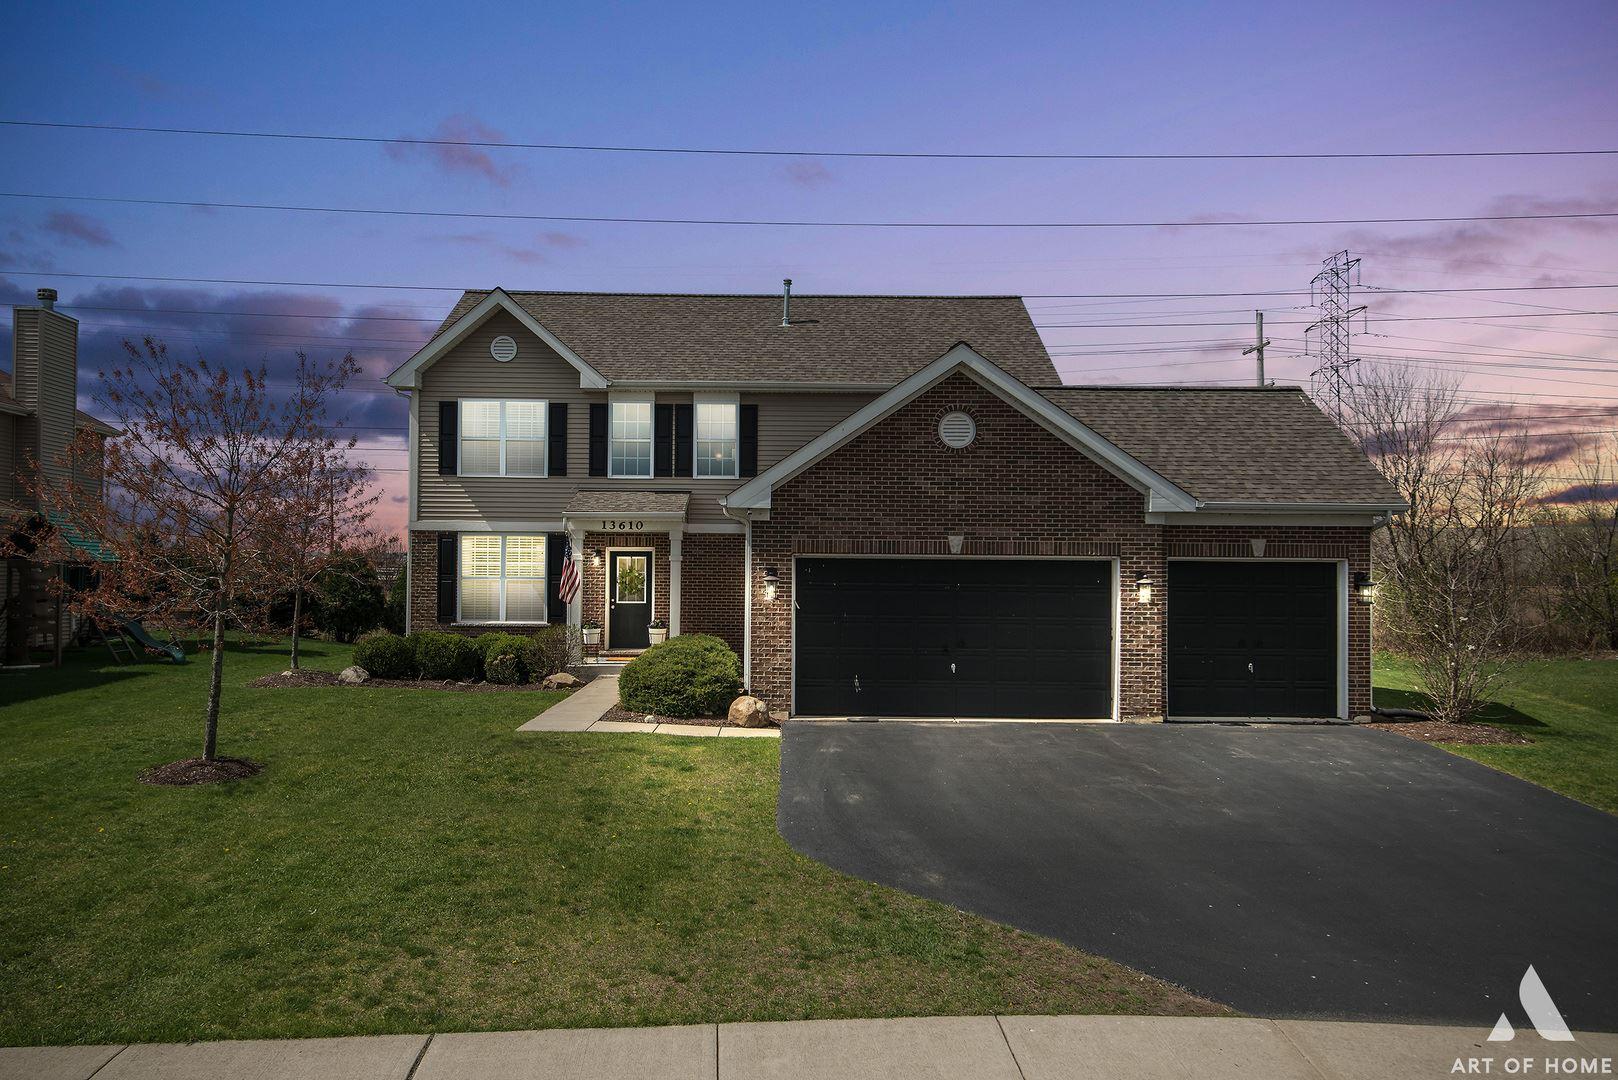 Photo of 13610 Taylor Court, Plainfield, IL 60544 (MLS # 11056590)